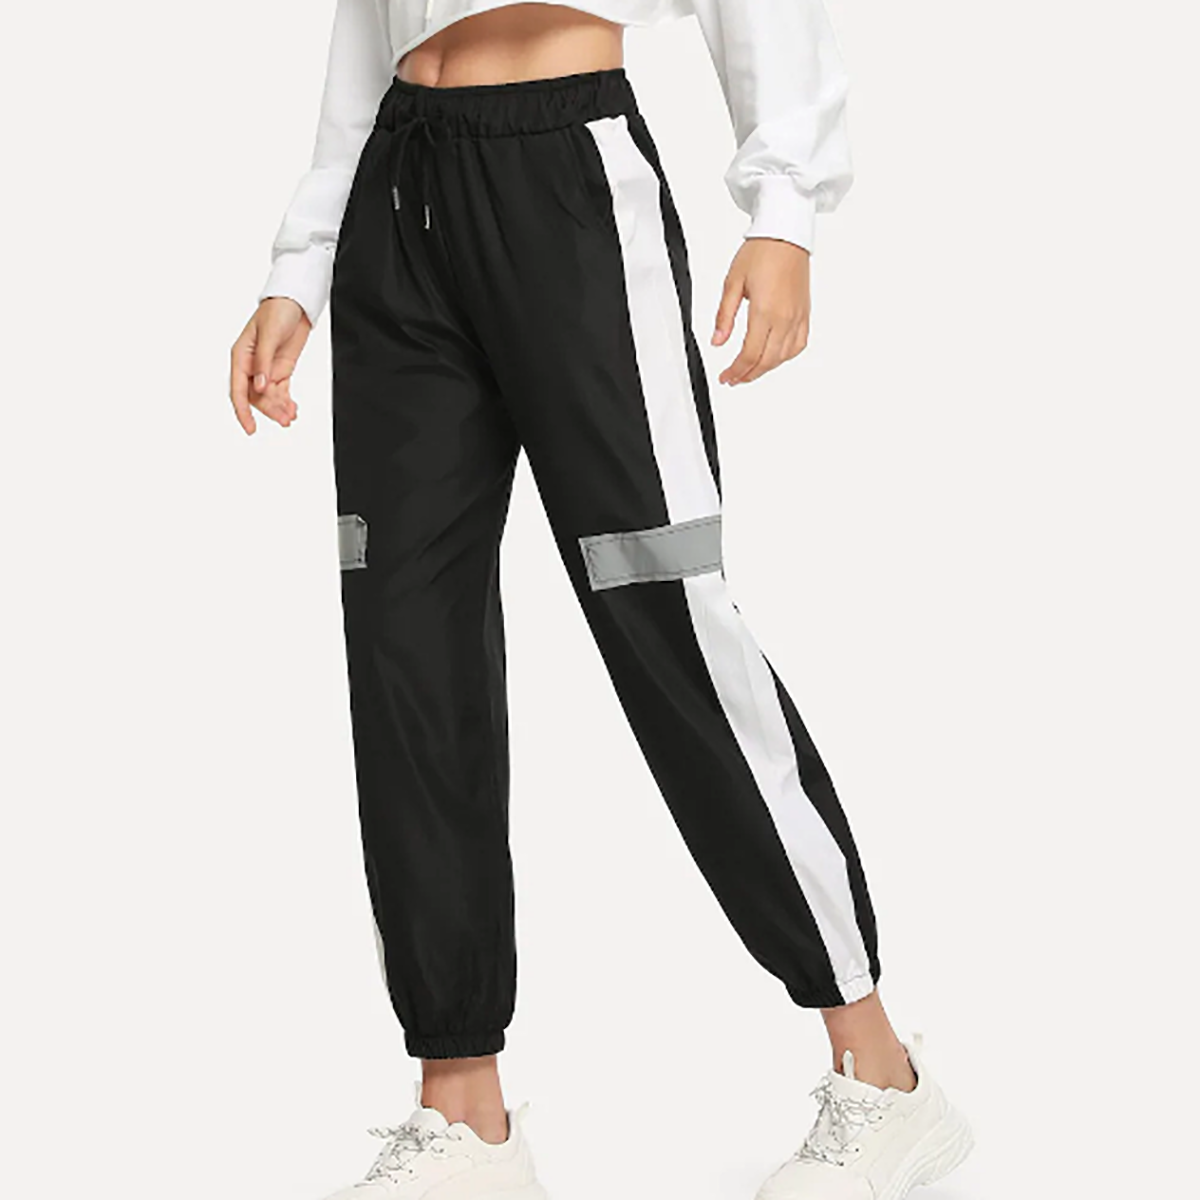 Fashion Plain Slim Casual Pants